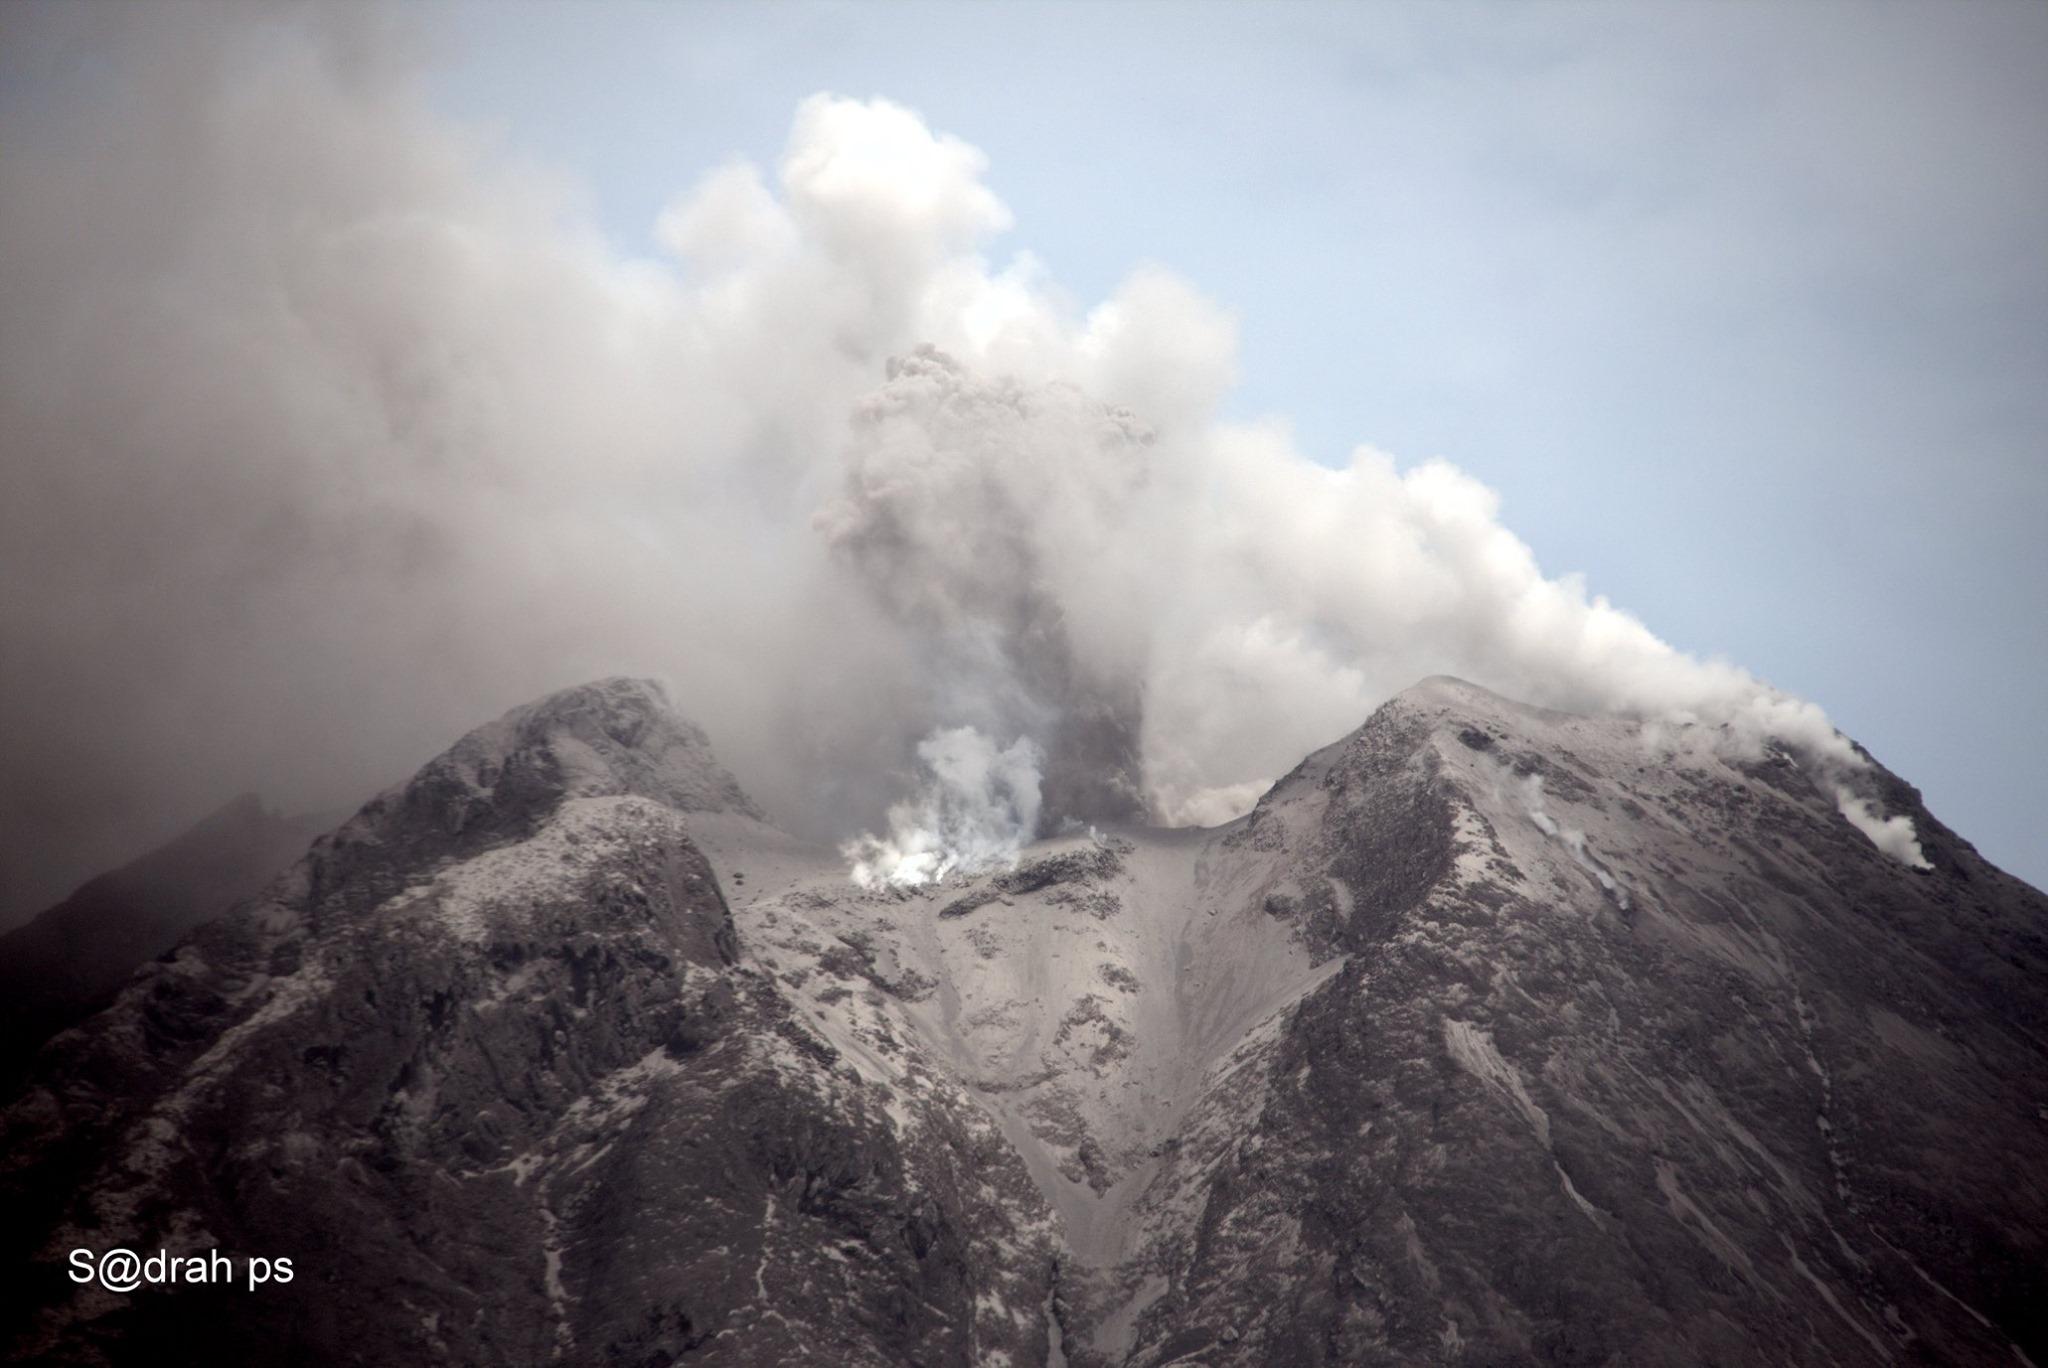 August 27, 2020. EN . Italy / Sicily : Etna , Indonesia : Sinabung , Hawaii : Mauna Loa , Japan : Sakurajima , Ecuador : Reventador .